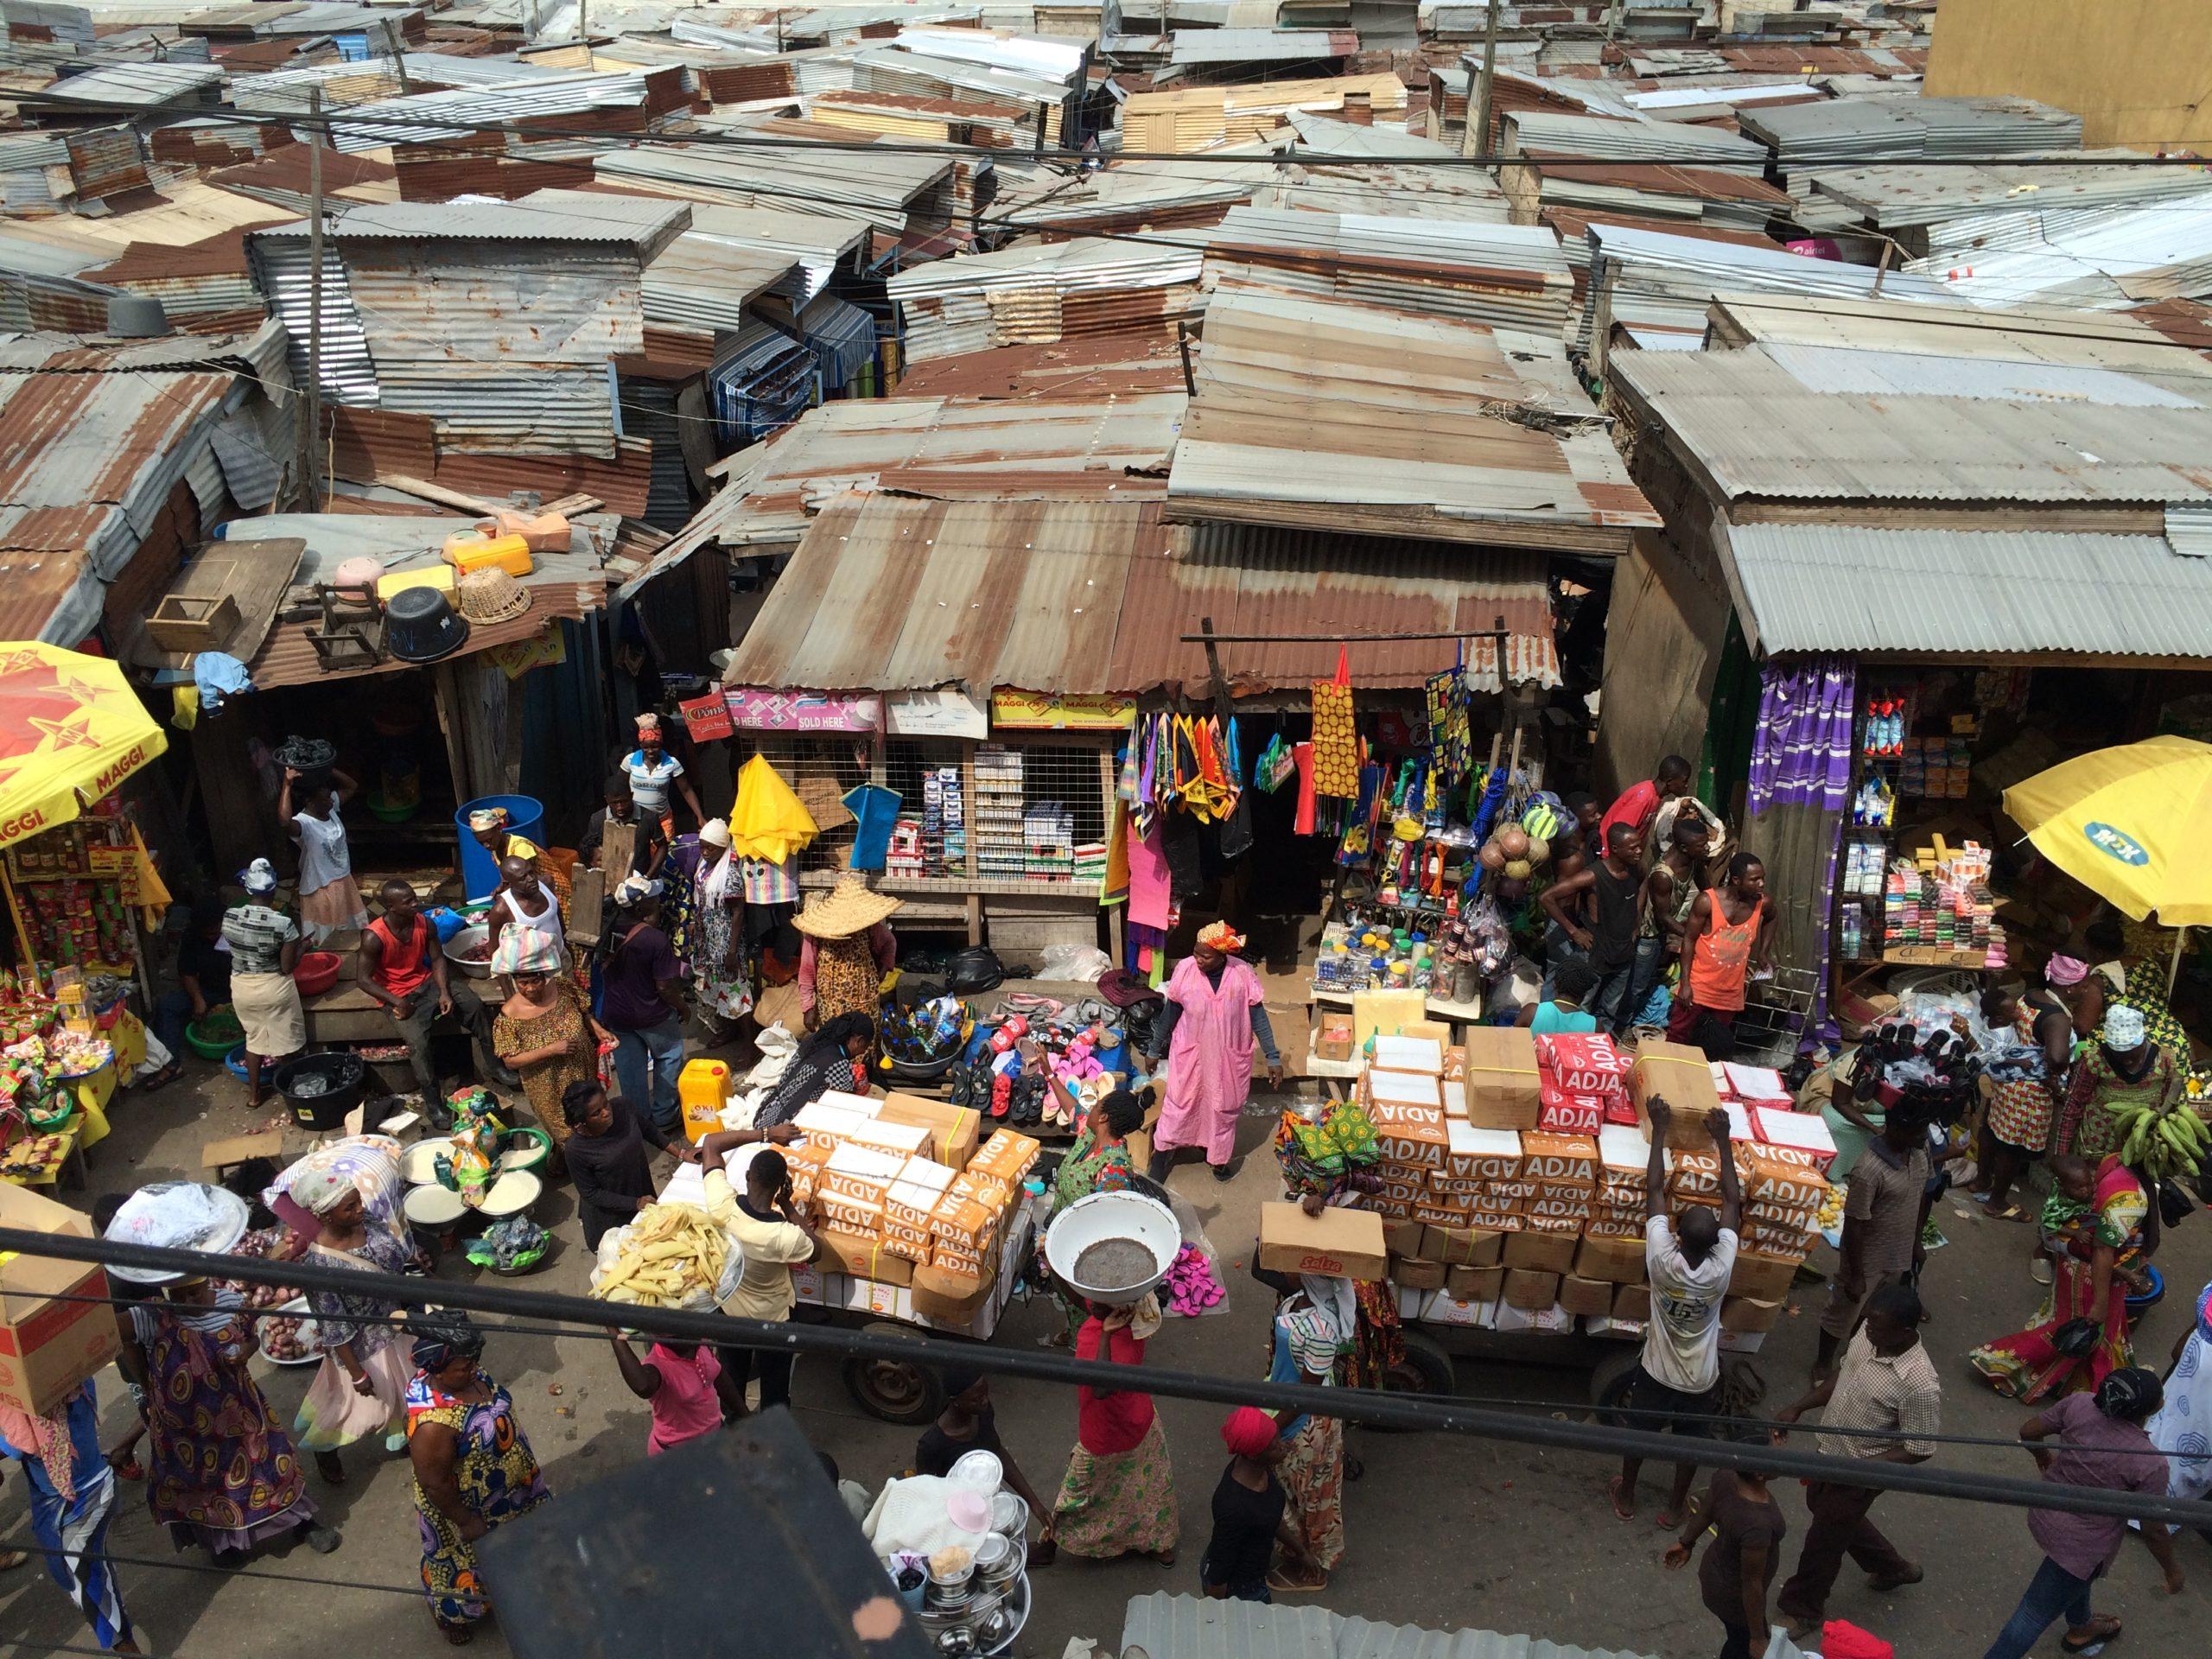 Goods, market traders, and corrugated iron stalls at Kumasi Central Market.